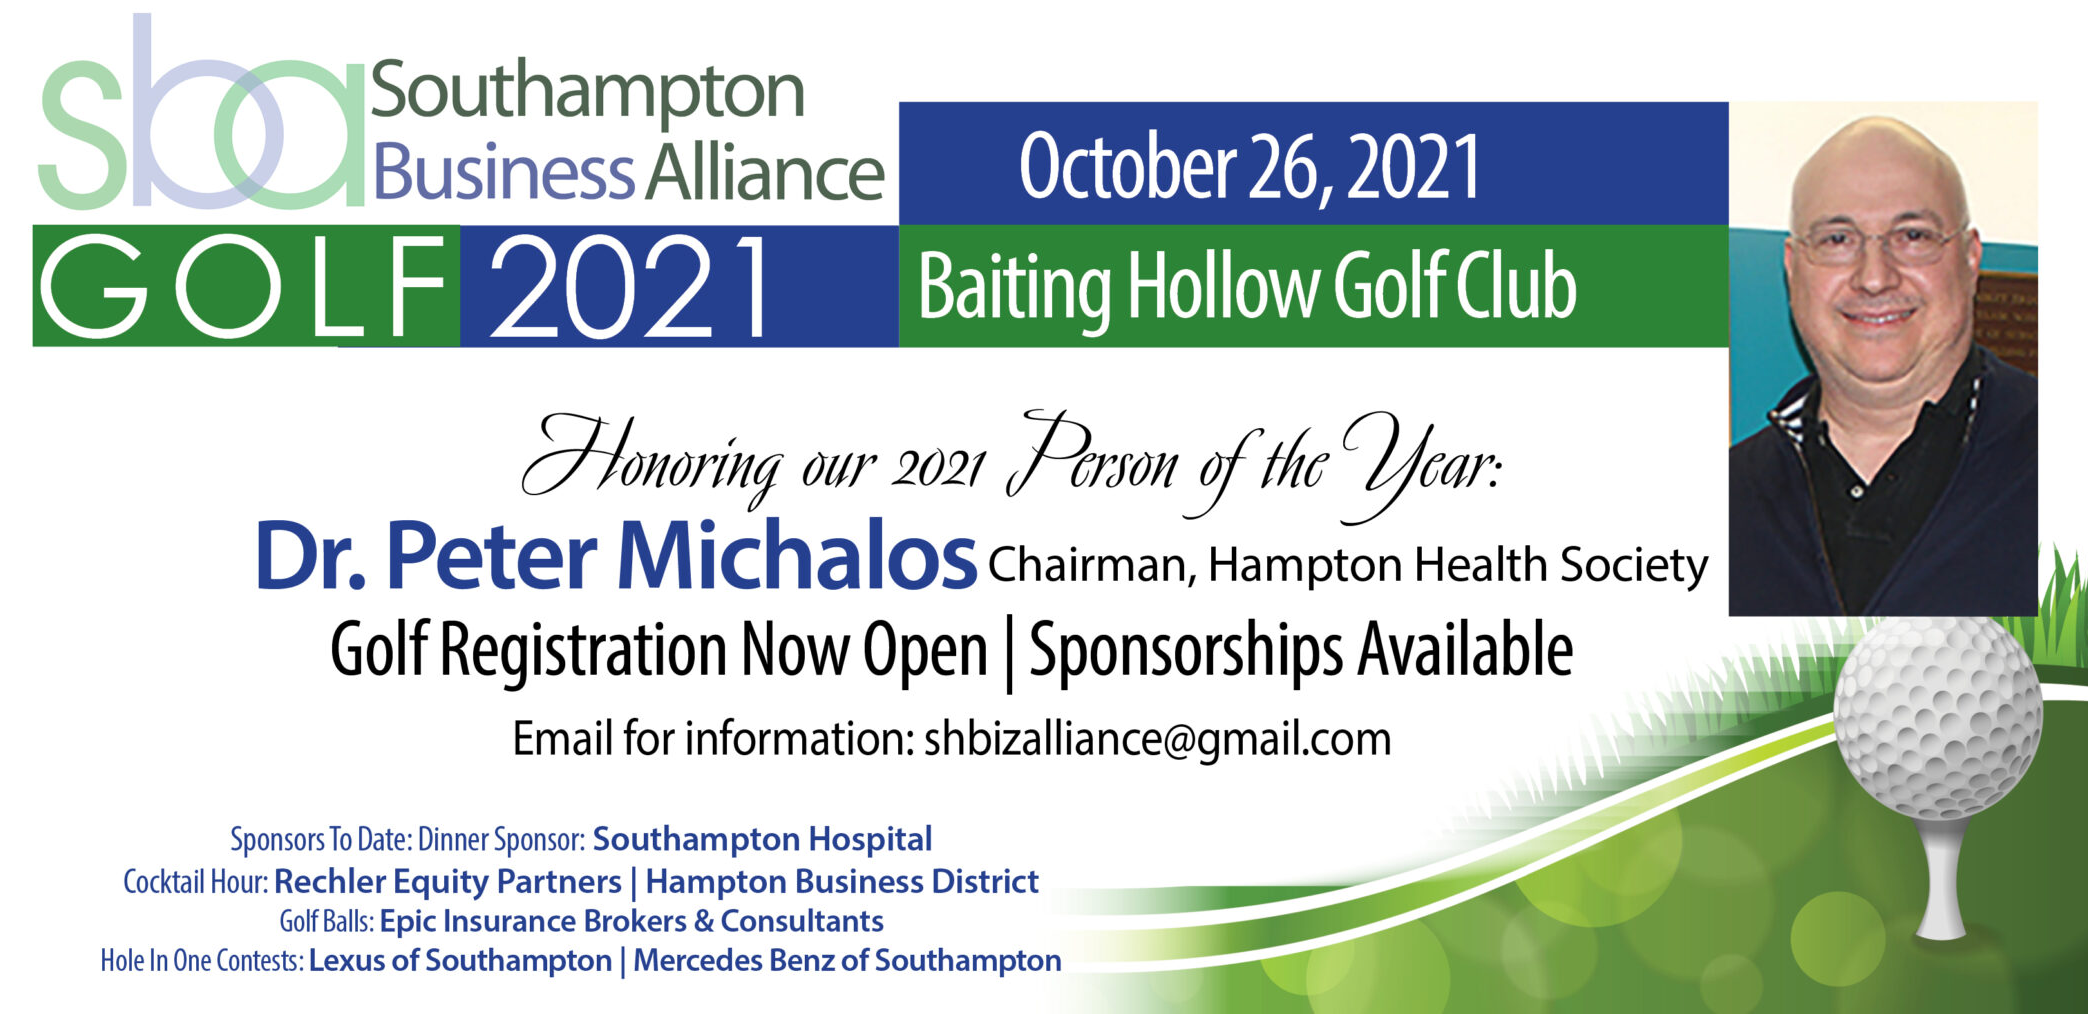 Southampton Business Alliance